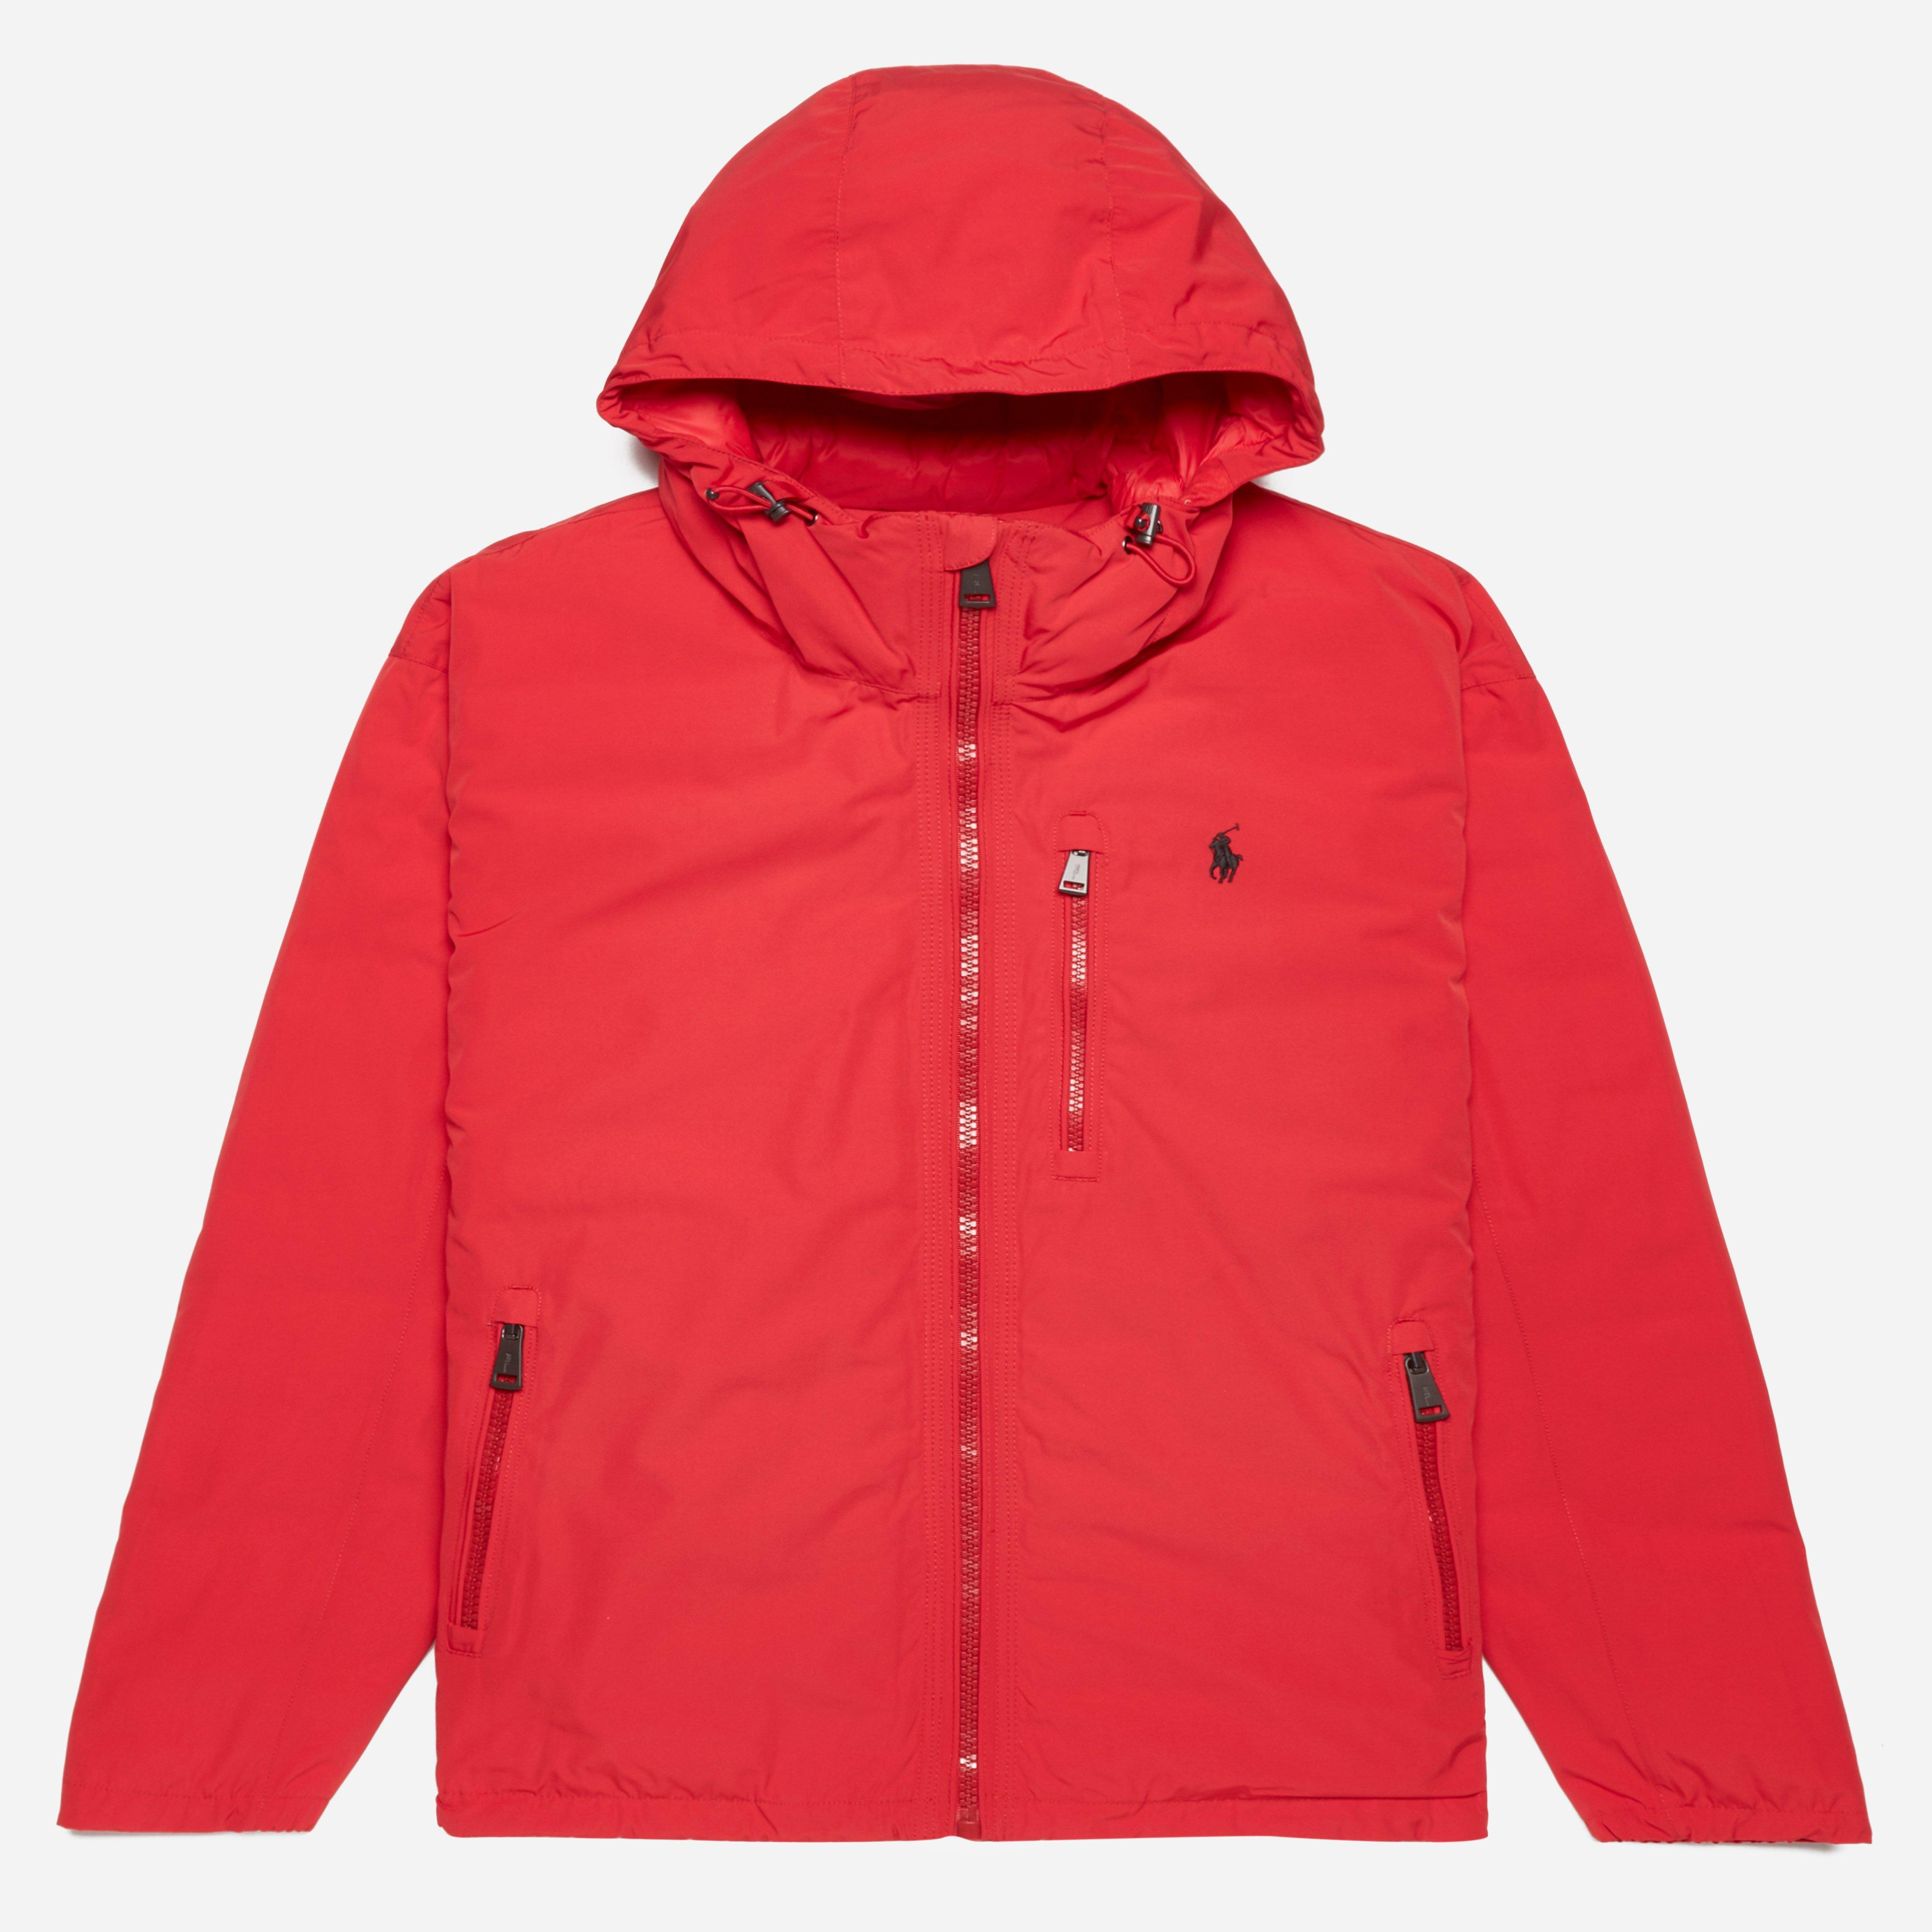 Polo Ralph Lauren Thorpe Anorak Jacket